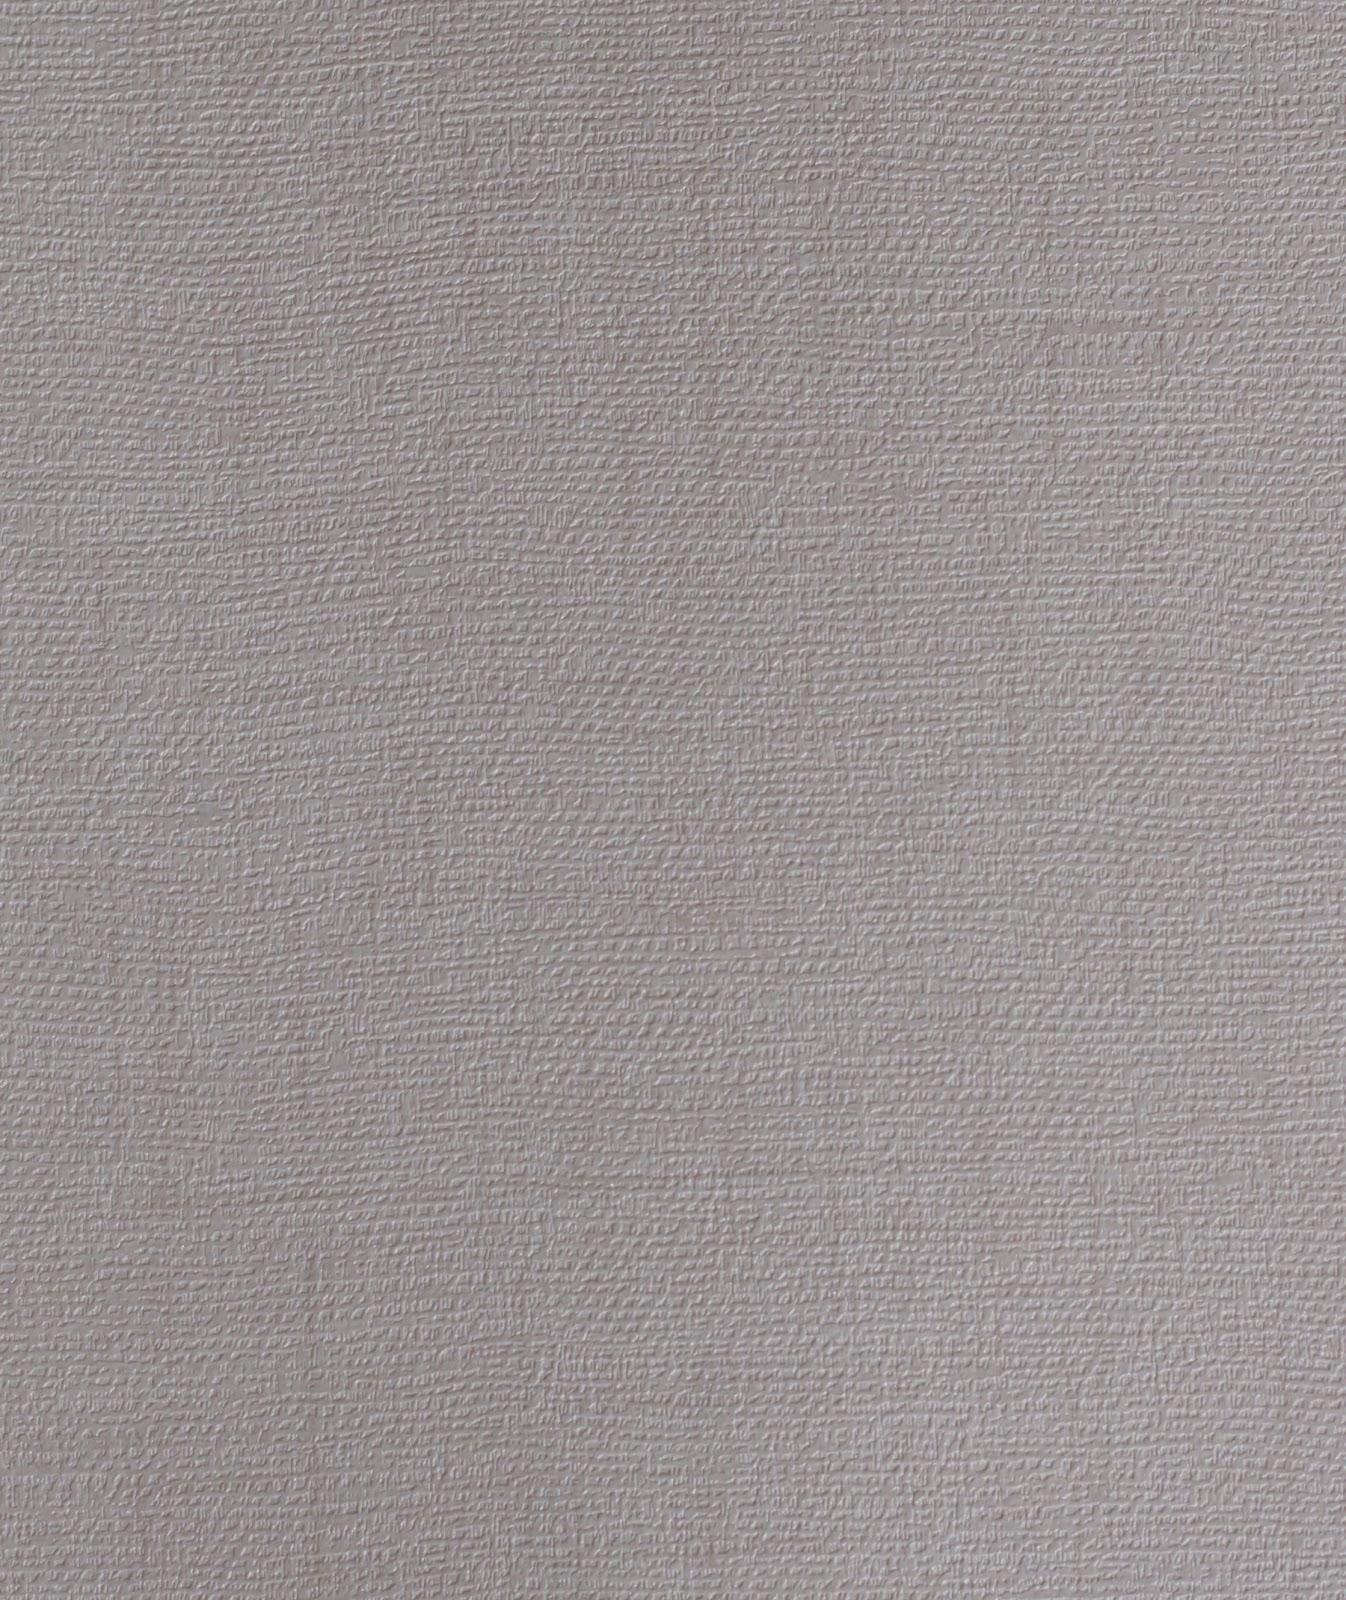 Free HD Wallpaper : Wallpaper Grosir - Download Free Wallpaper ...